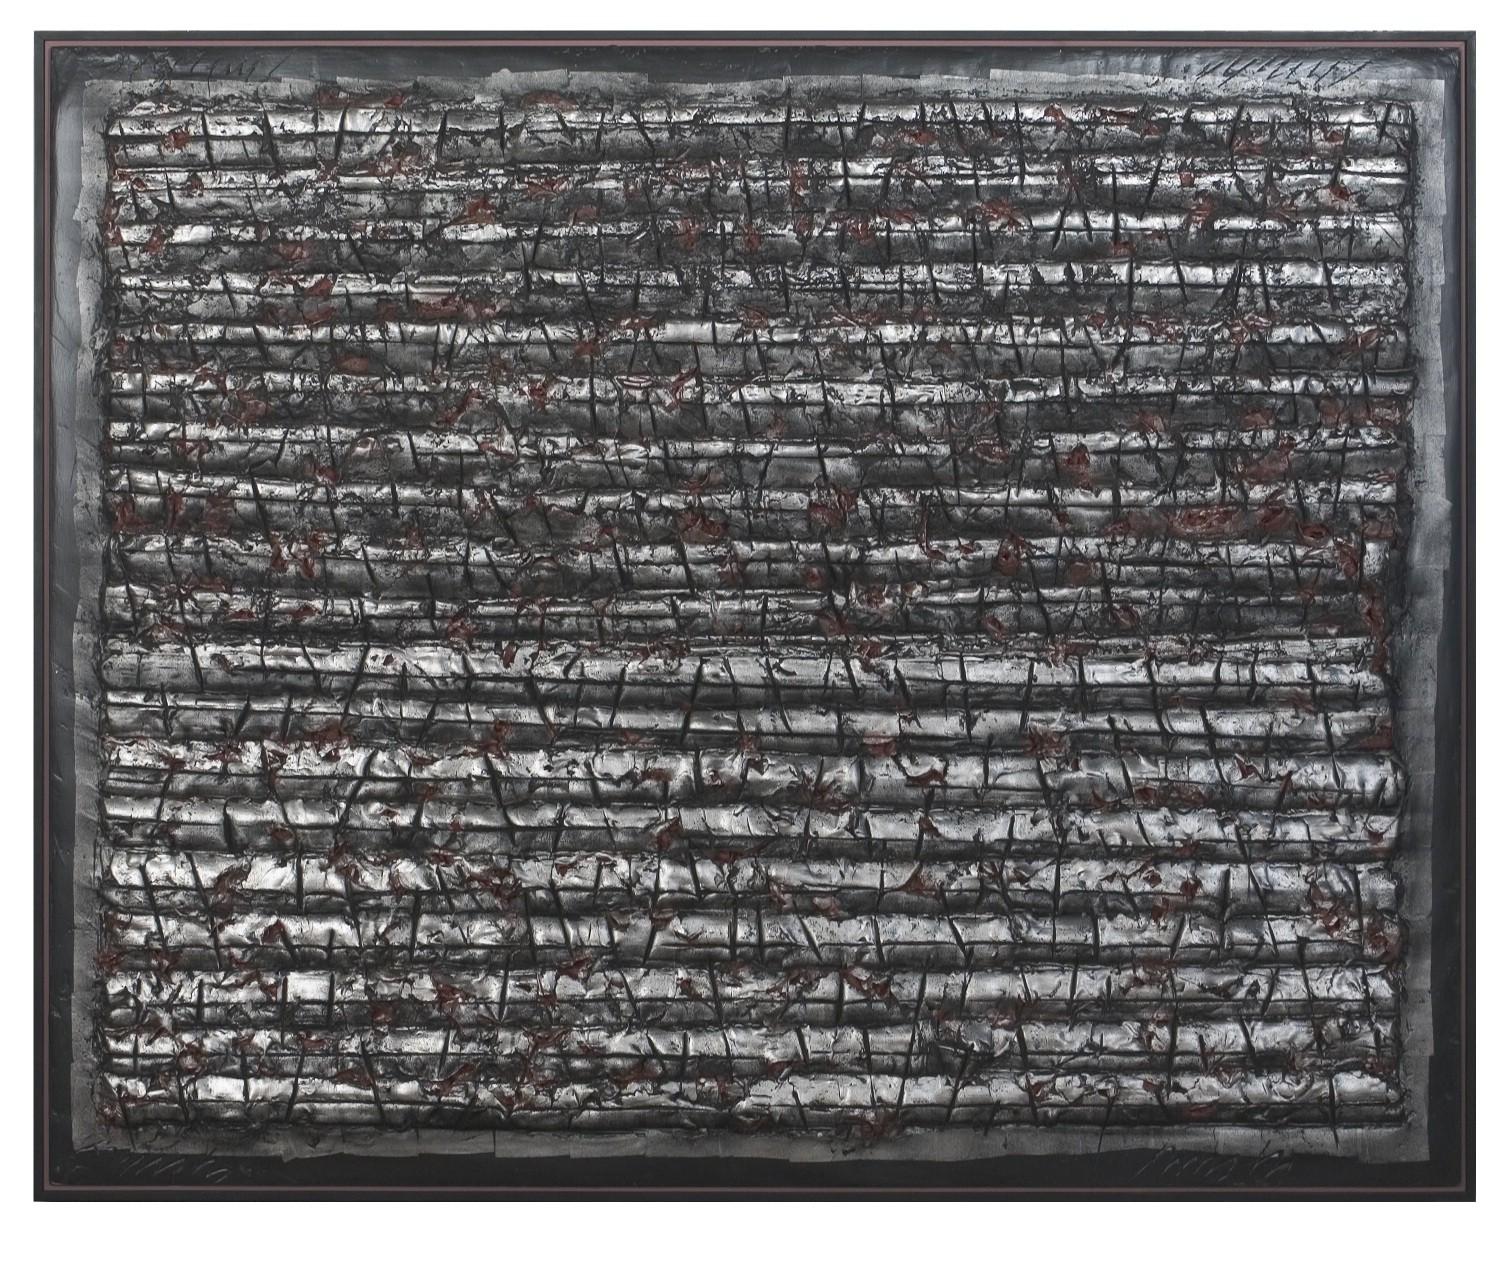 Marshgrass No. 4, 1999